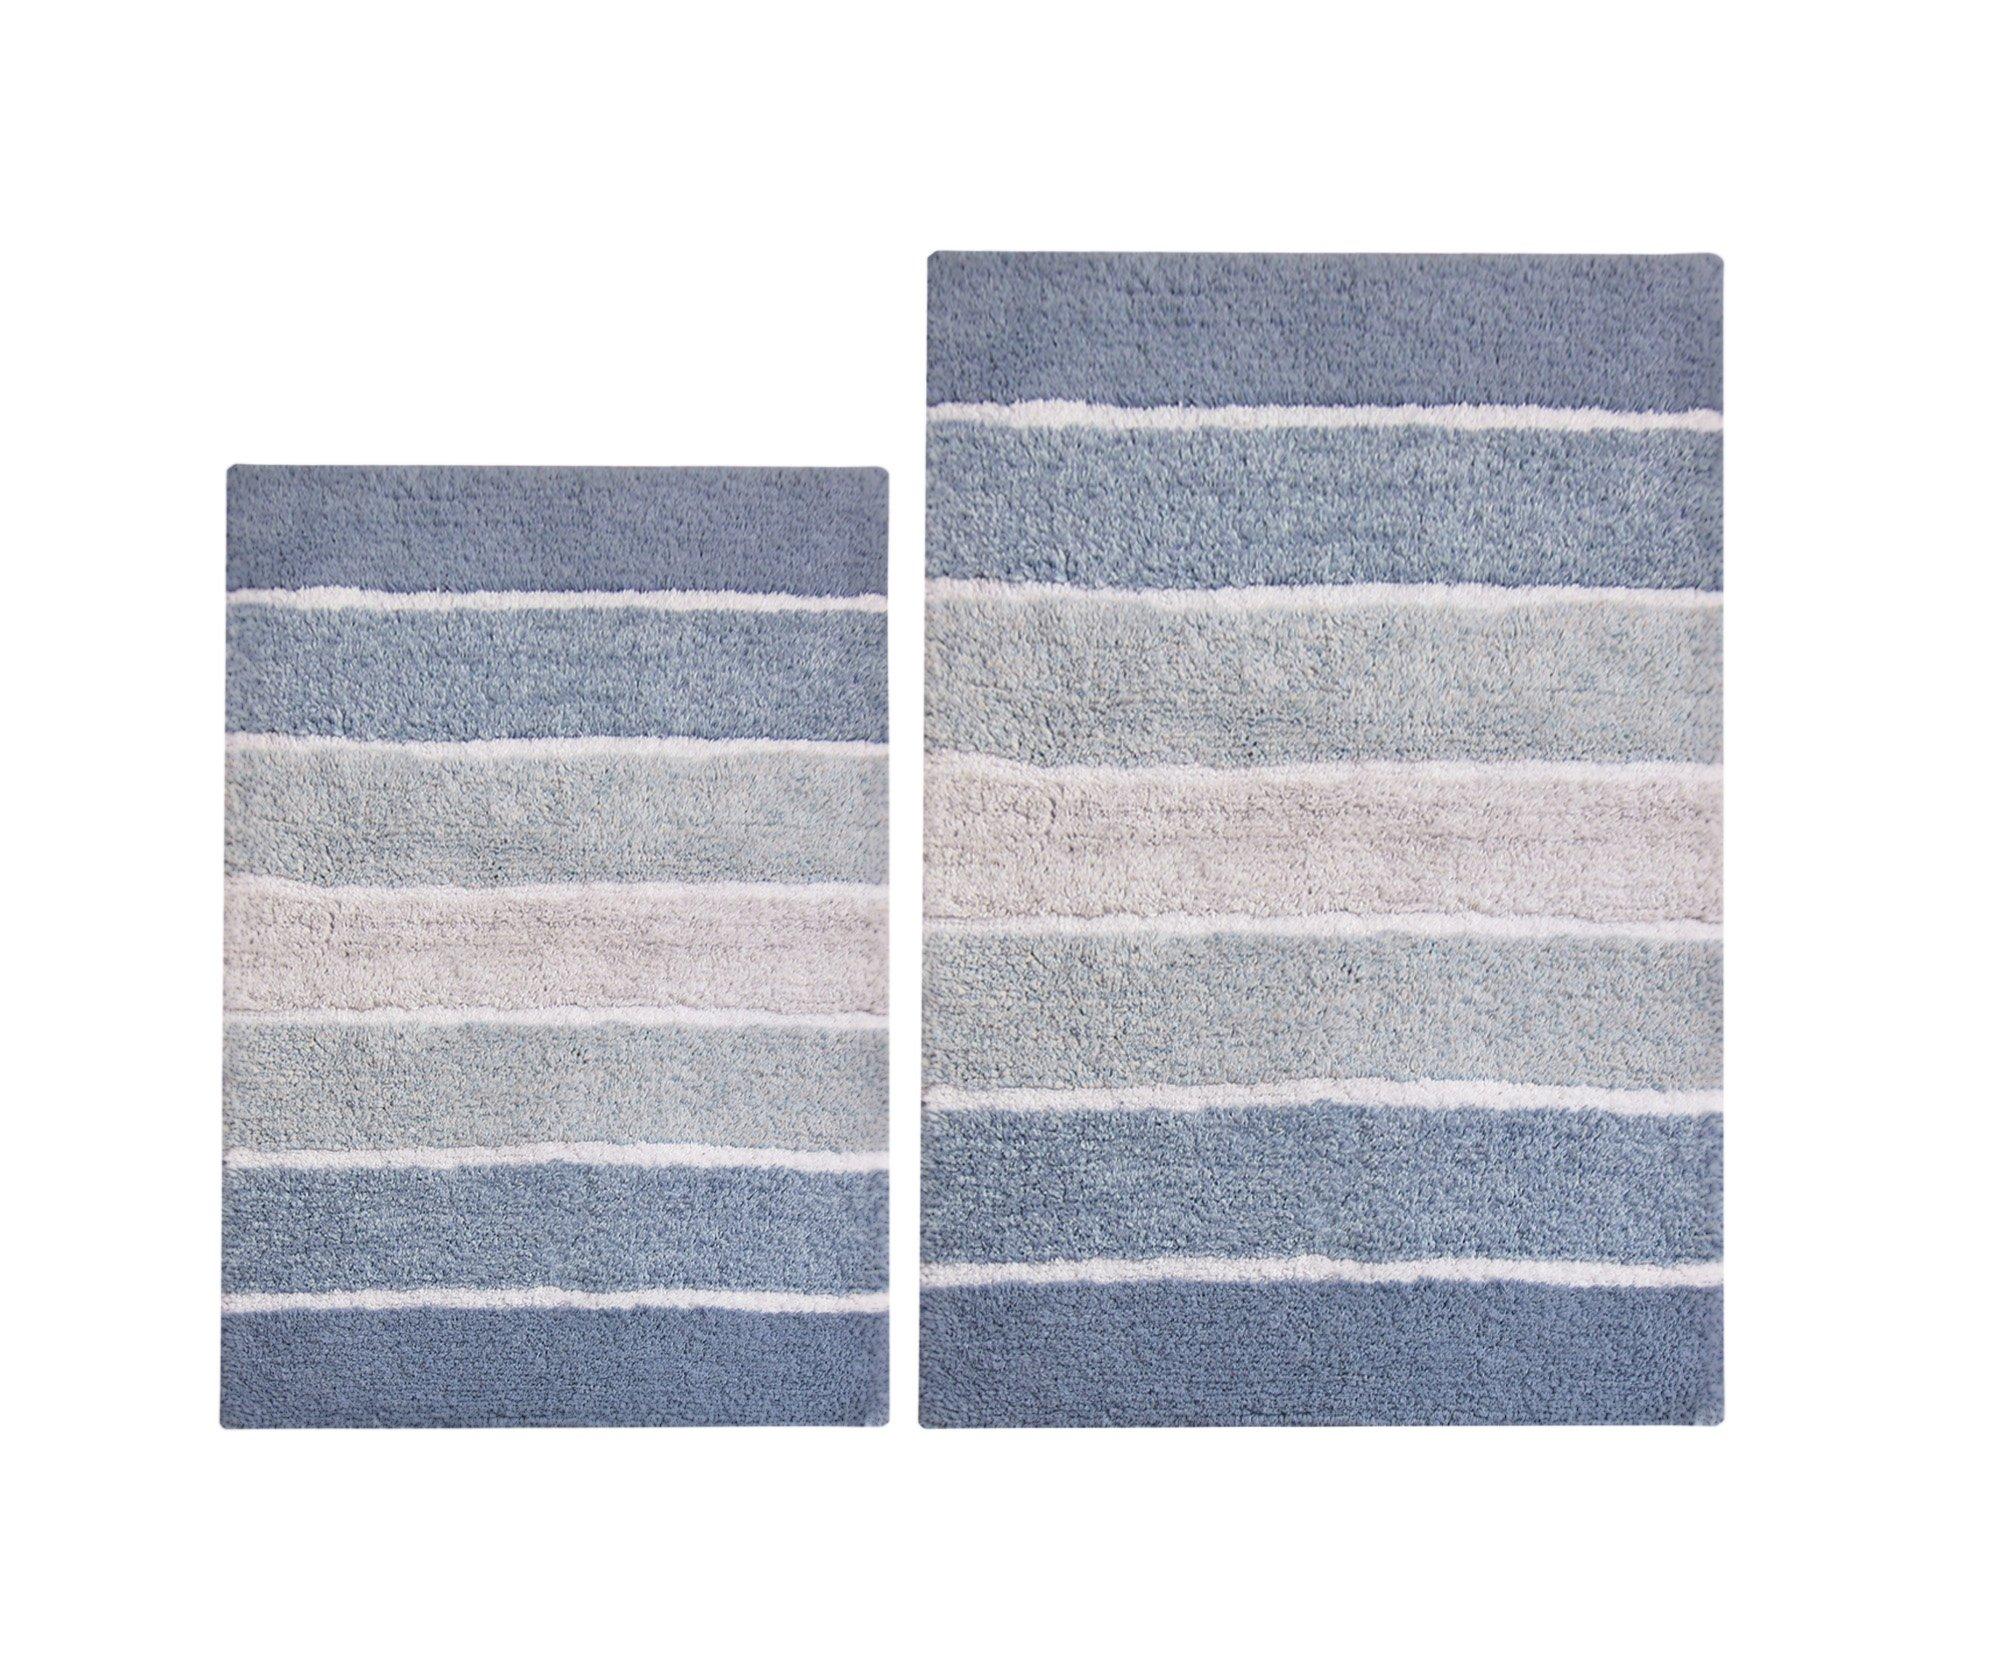 Chardin home 100% Pure Cotton - 2 Piece Cordural Stripe Bath Rug Set, (21''x34'' & 17''x24'') Blues with Latex spray non-skid backing